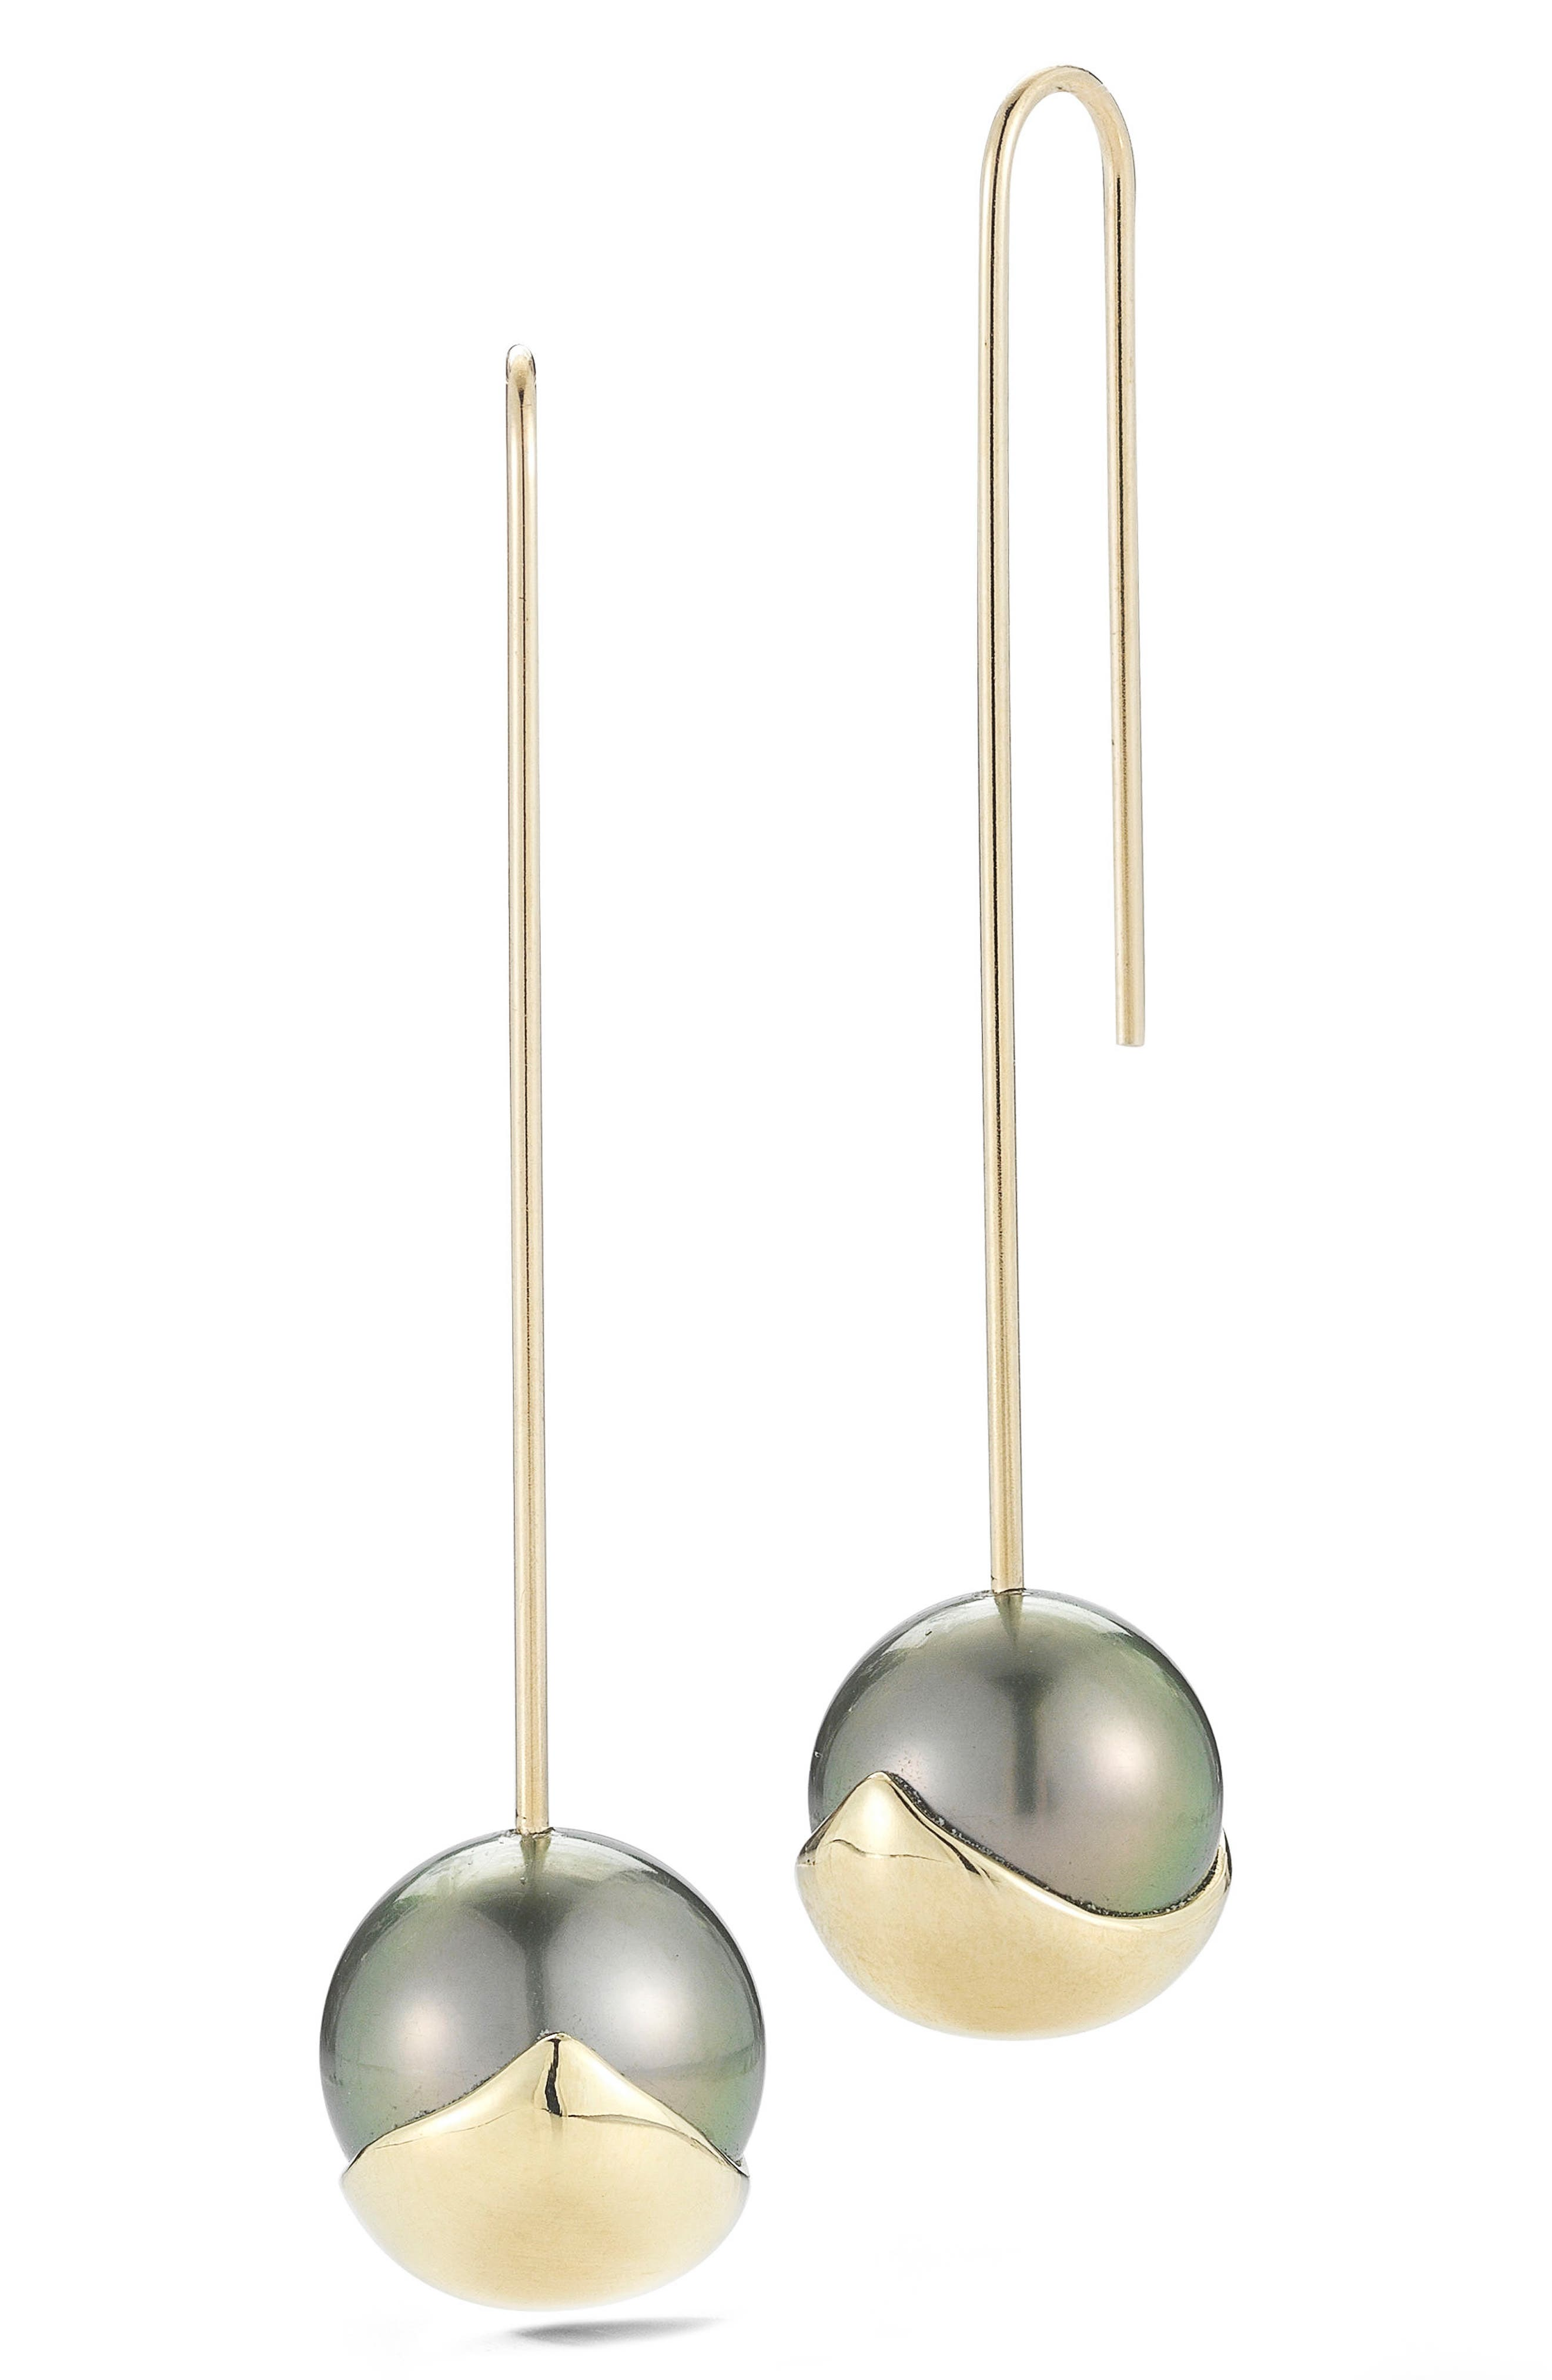 Sea of Beauty Pearl Drop Earrings,                             Main thumbnail 1, color,                             Yellow Gold/ Black Pearl